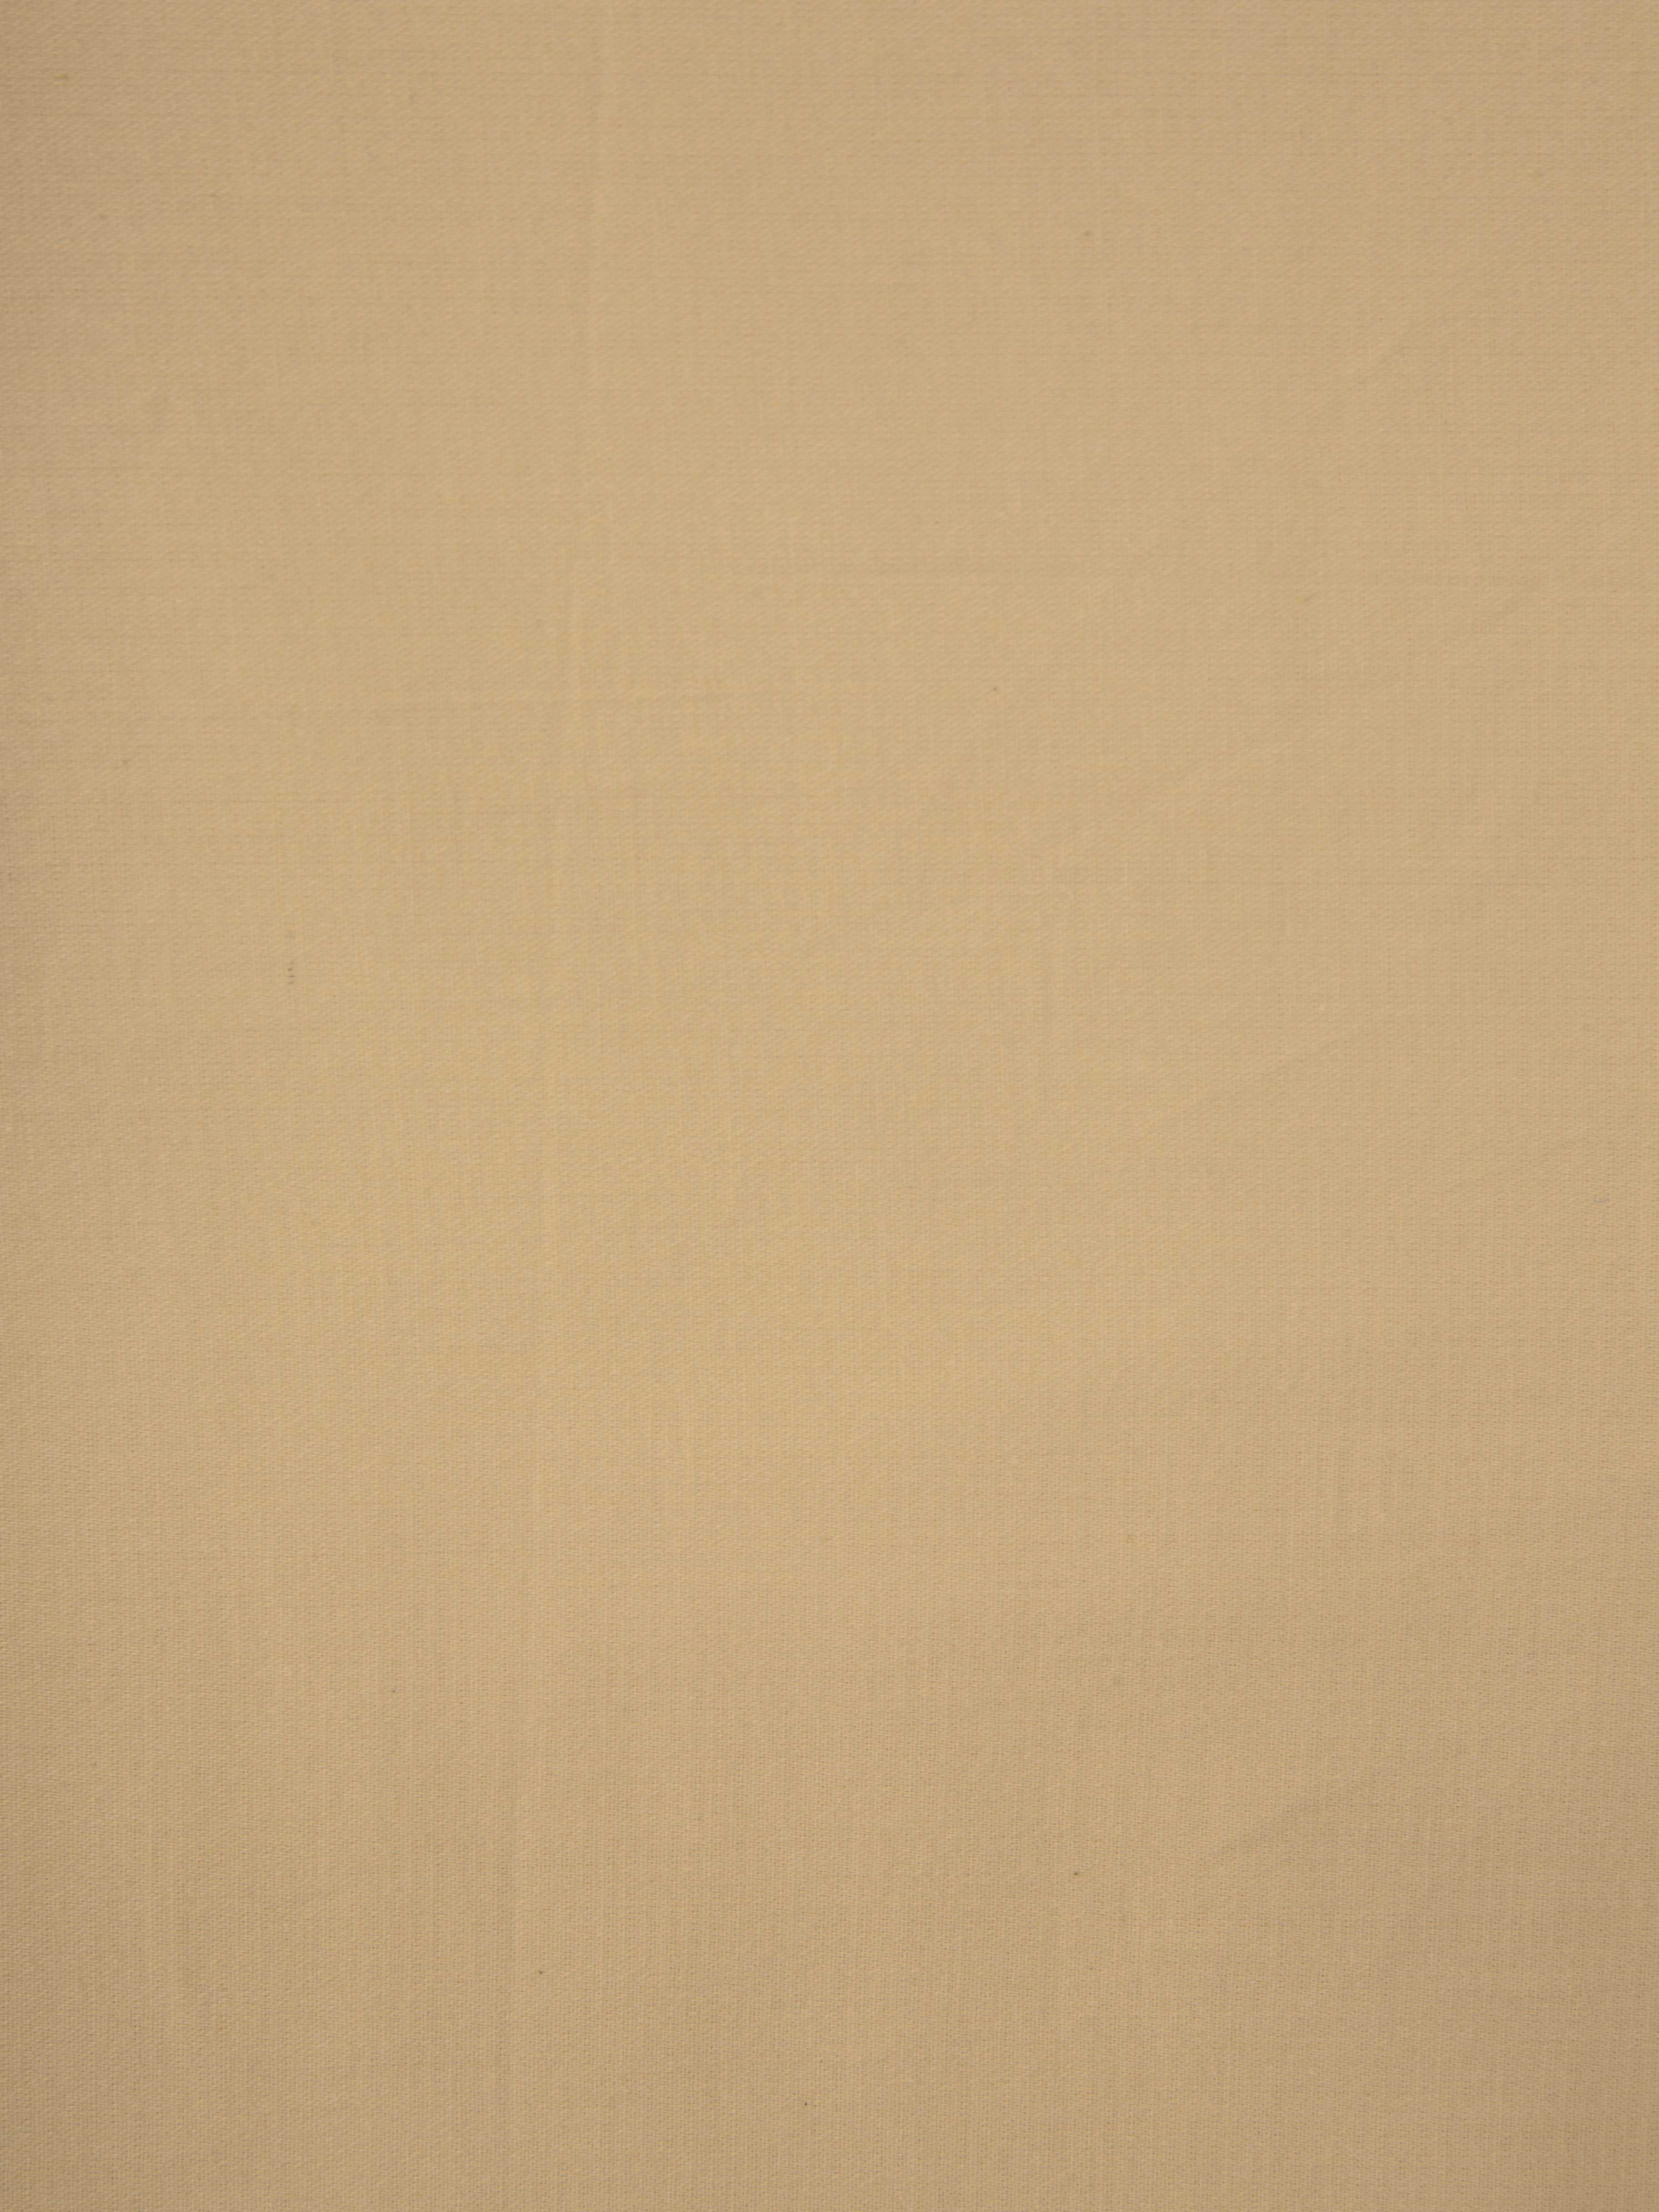 Brown bed sheet textures - Brown Bed Sheet Textures 59